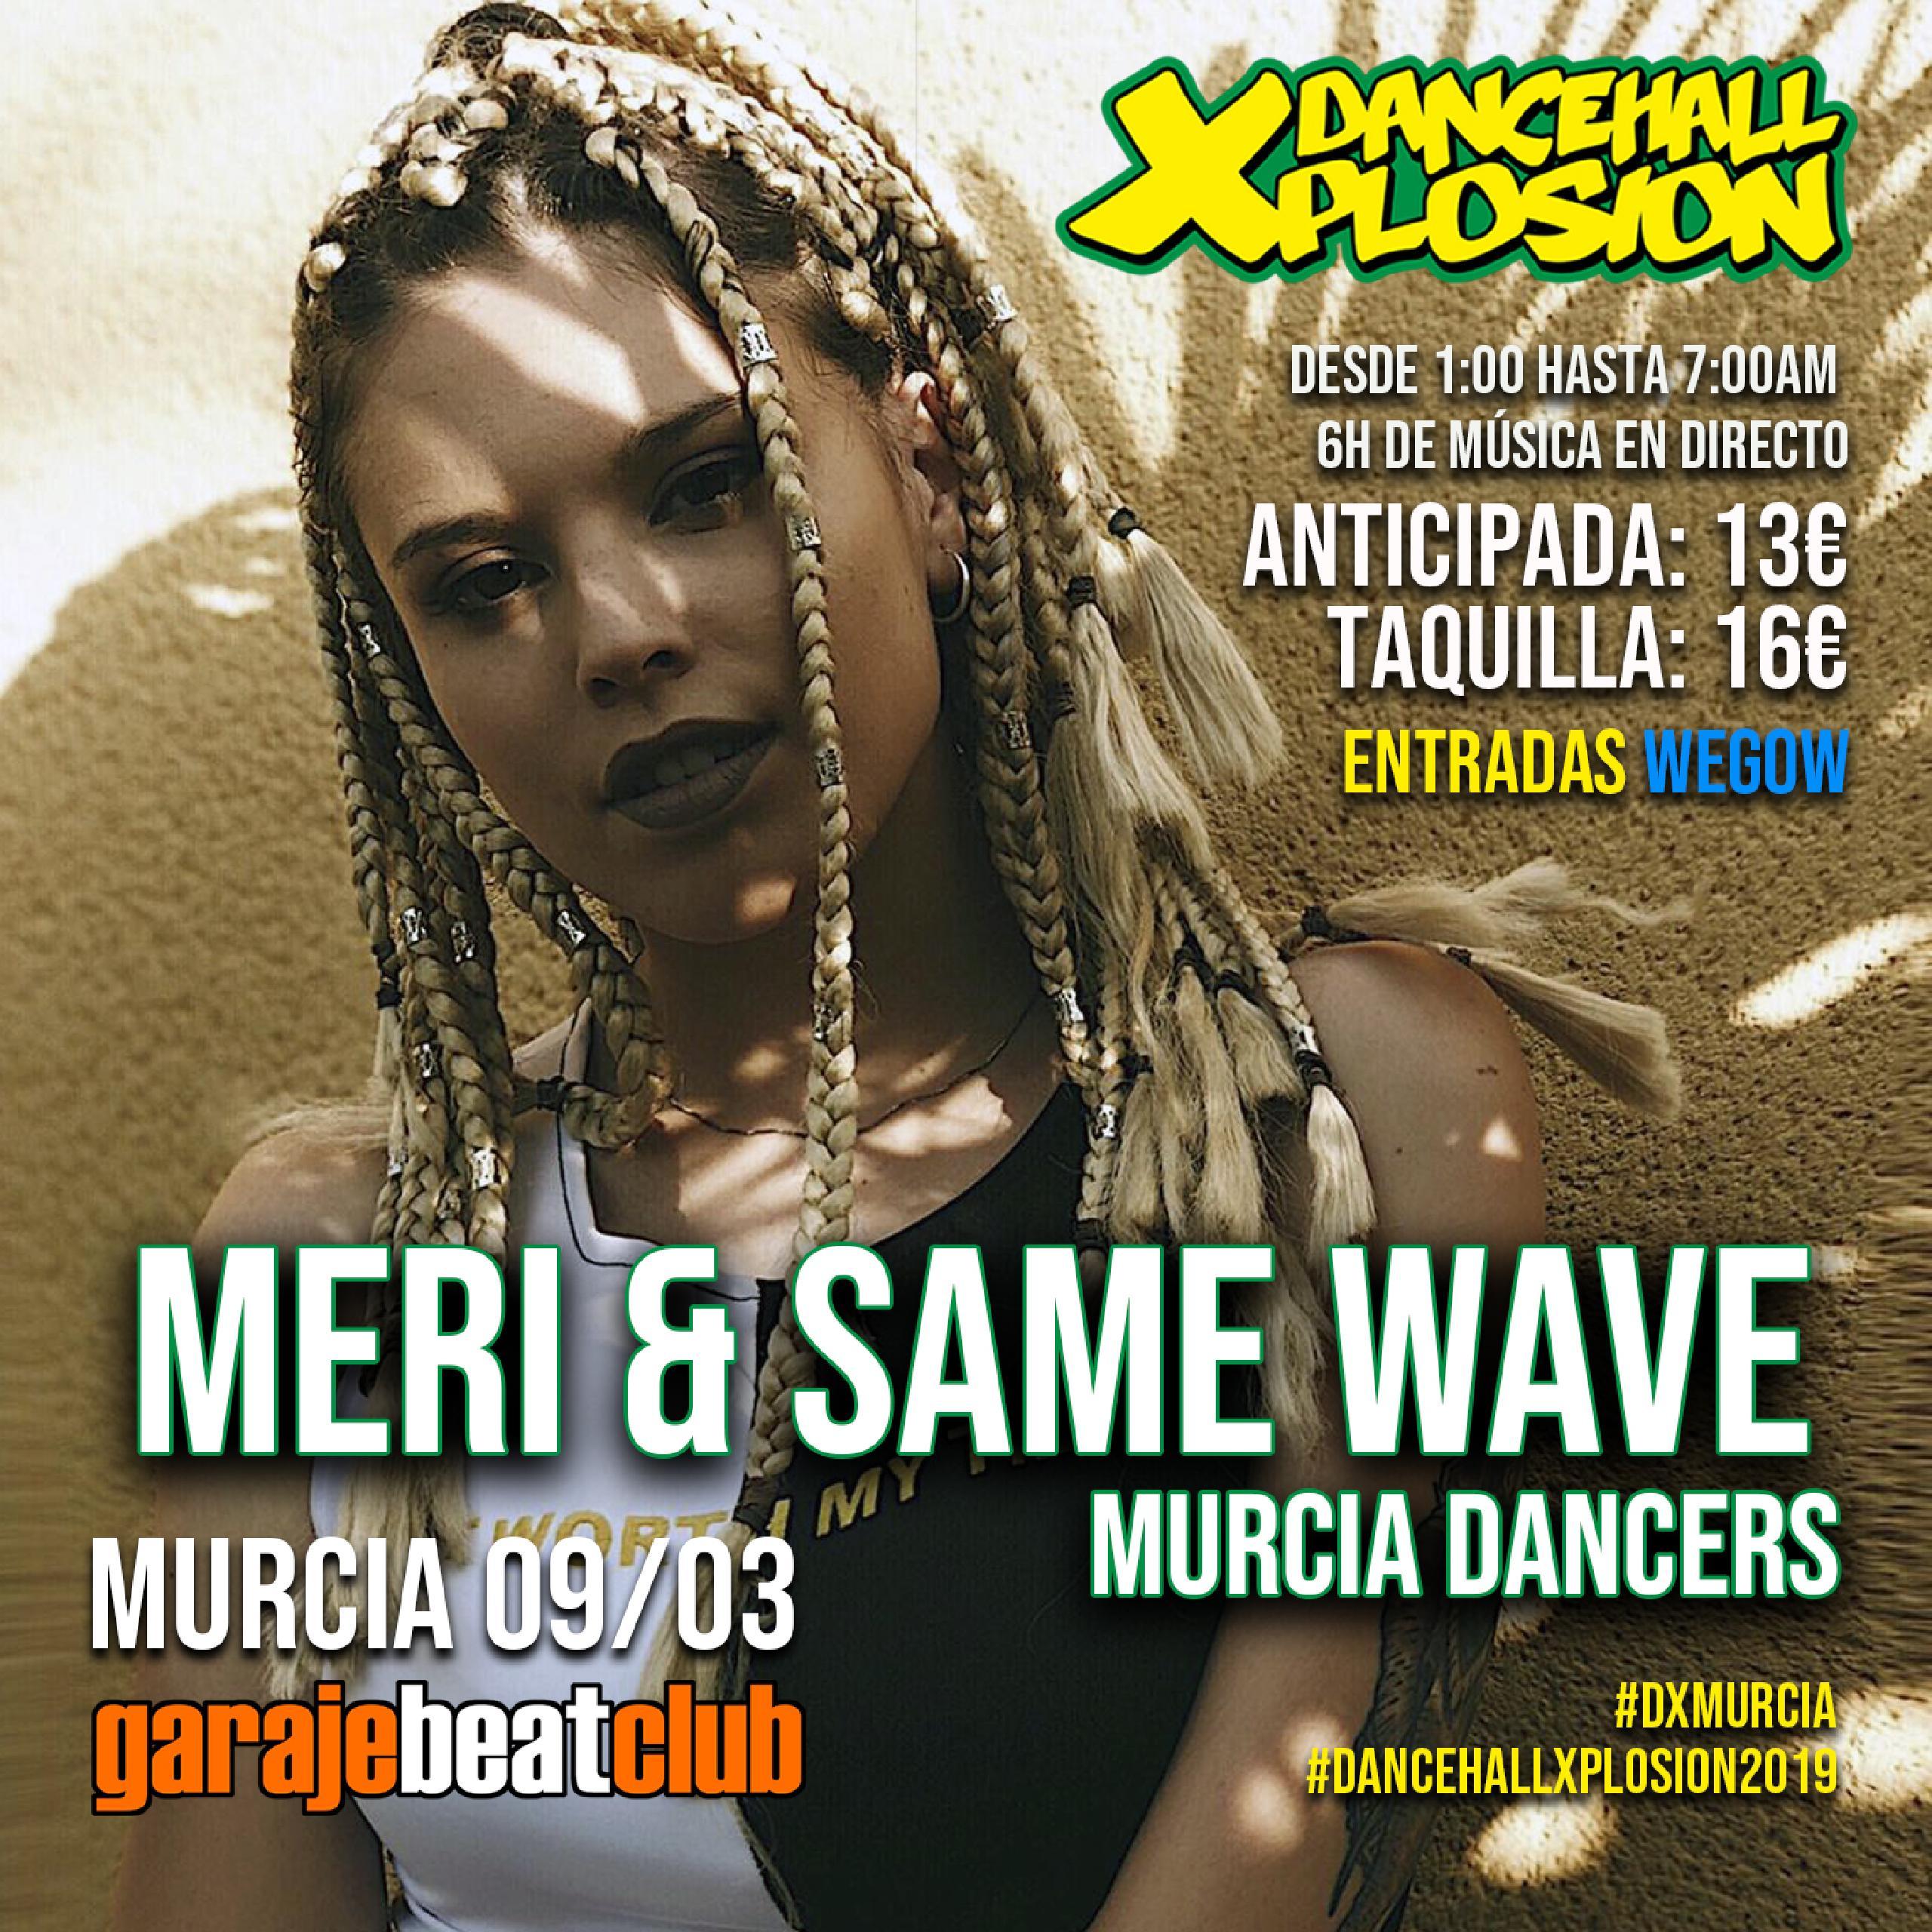 Meri & Same Wave en #DxMurcia